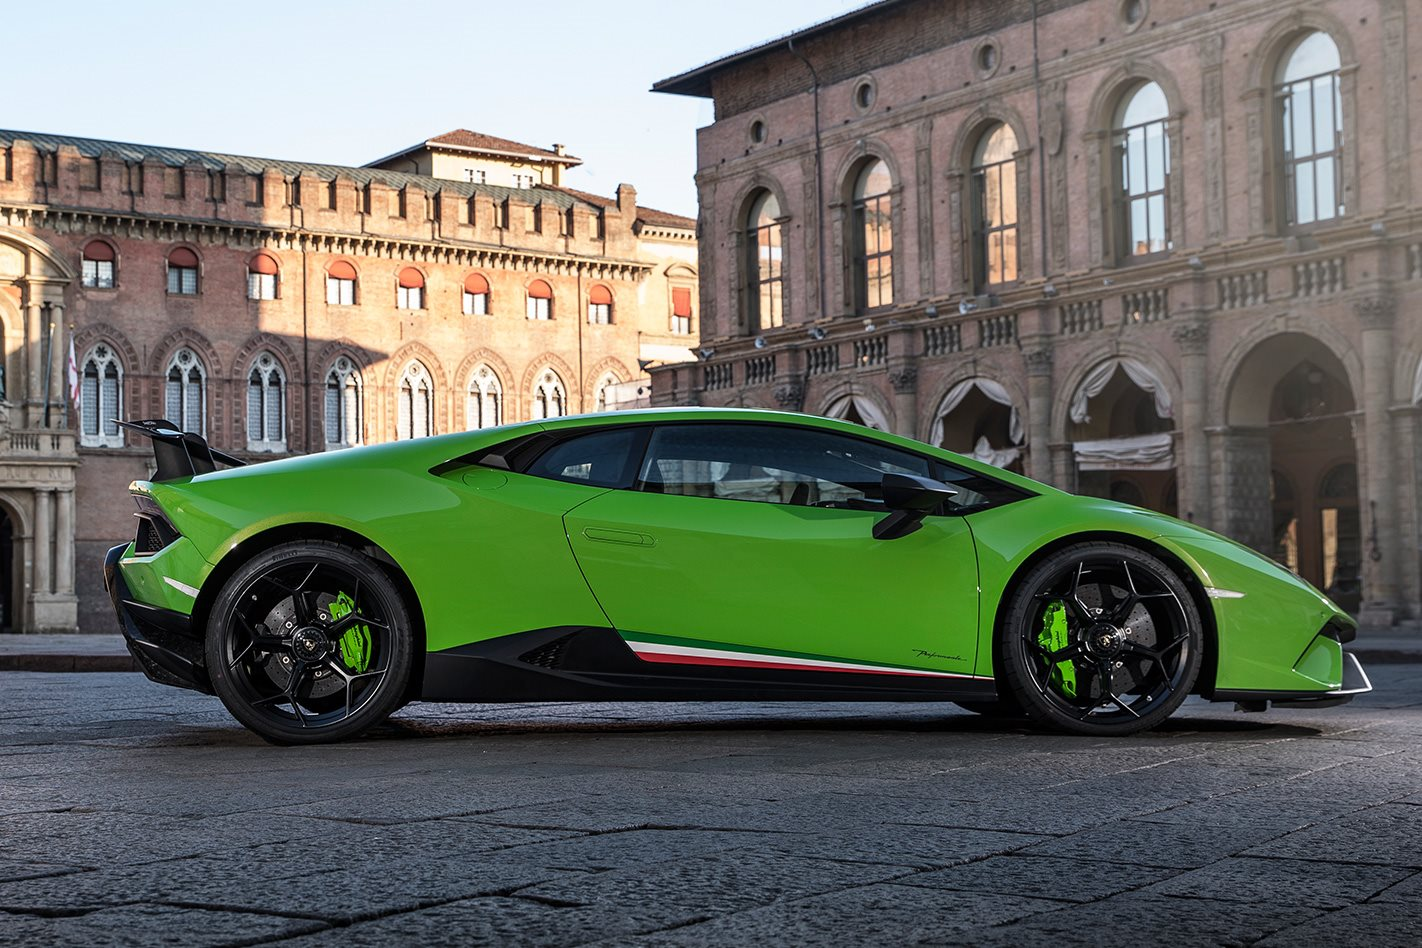 2017 Lamborghini Huracan Performante side profile